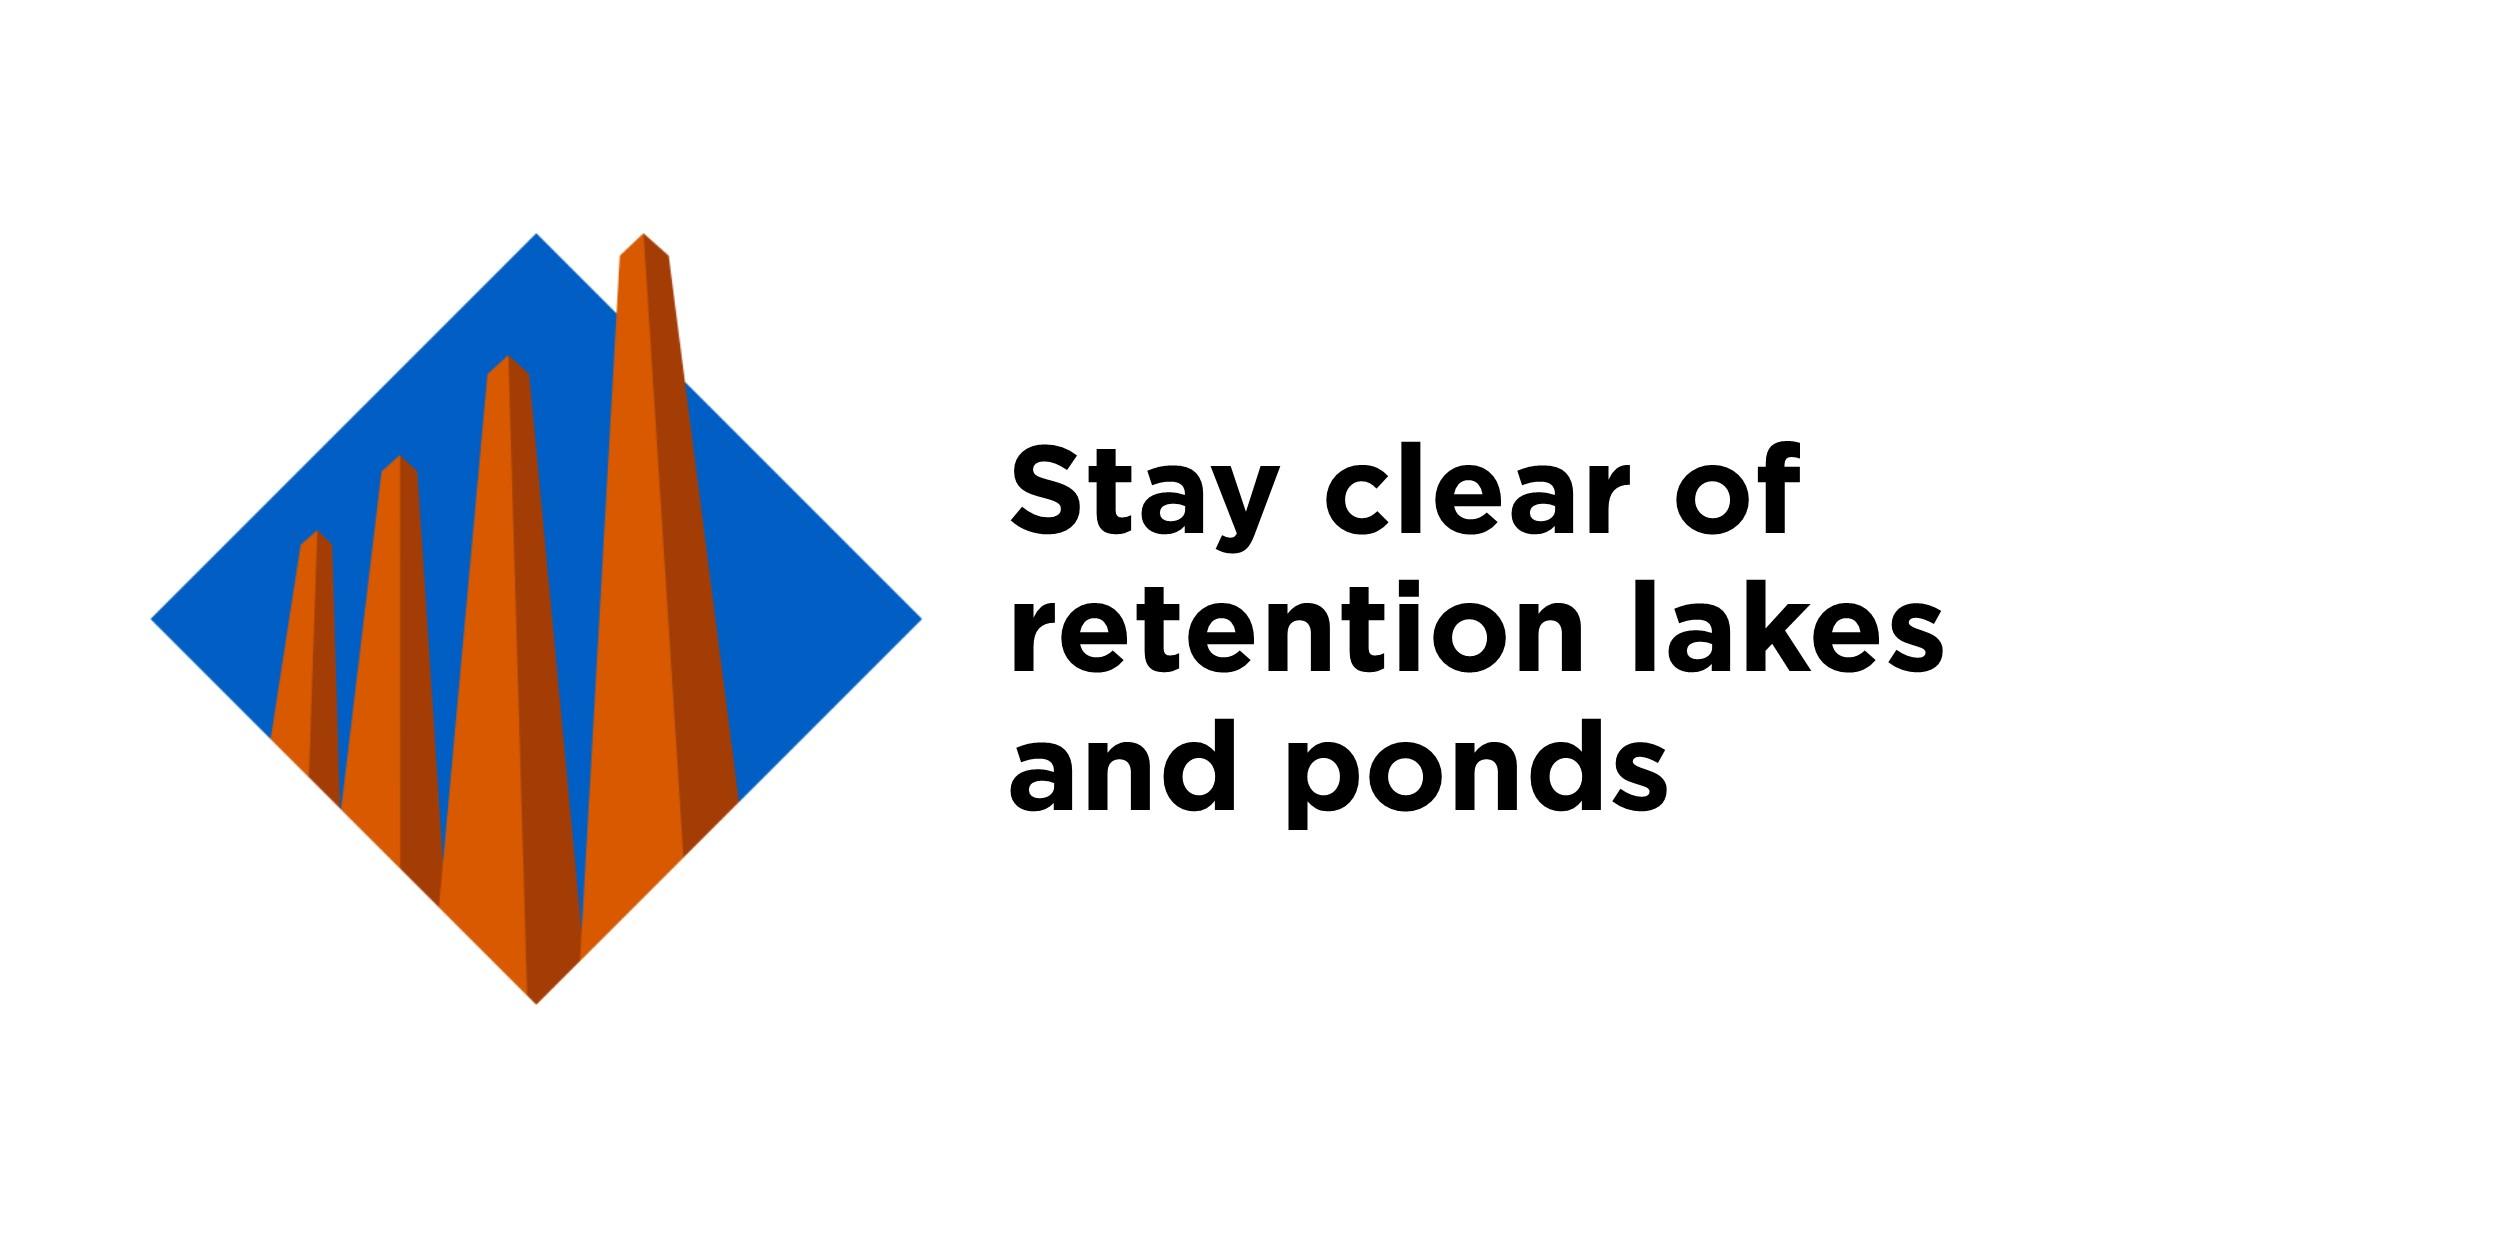 Retention Lake safety